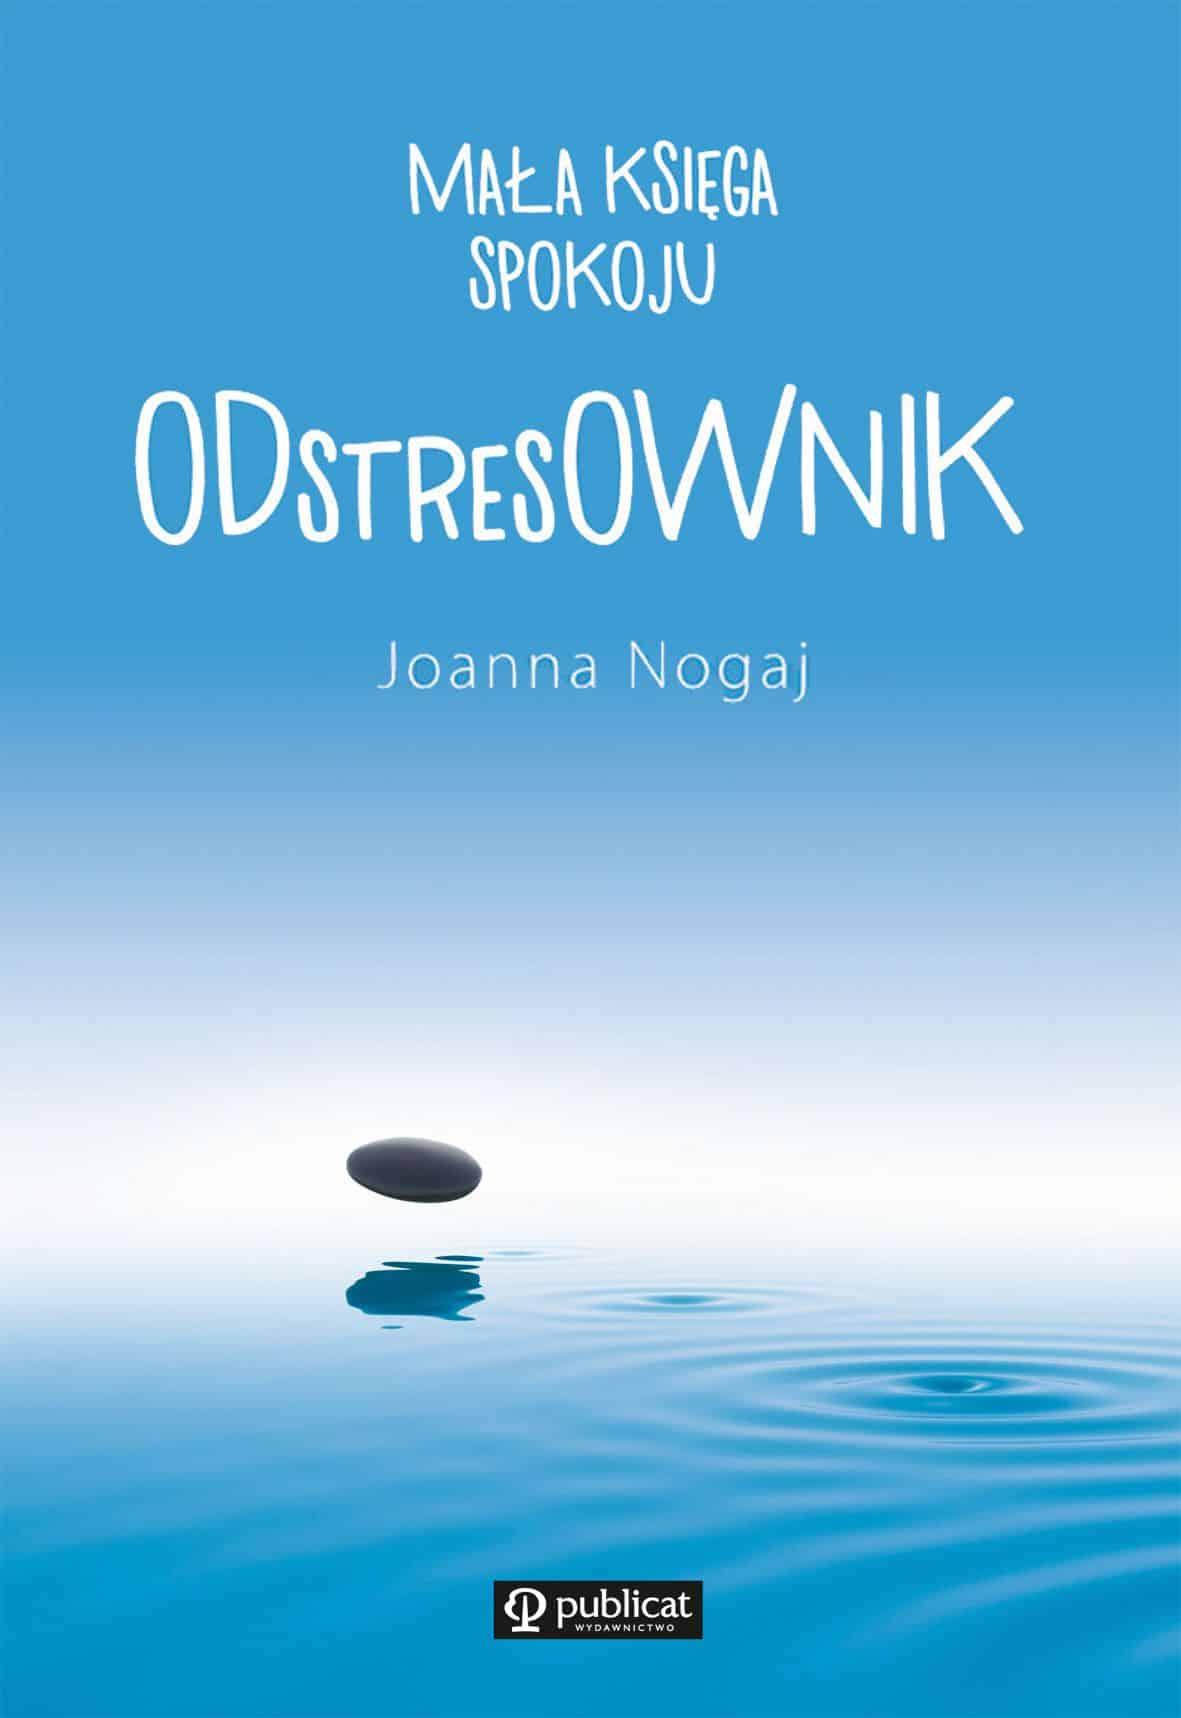 """Mała księga spokoju. ODstresOWNIK"" Joanny Nogaj"